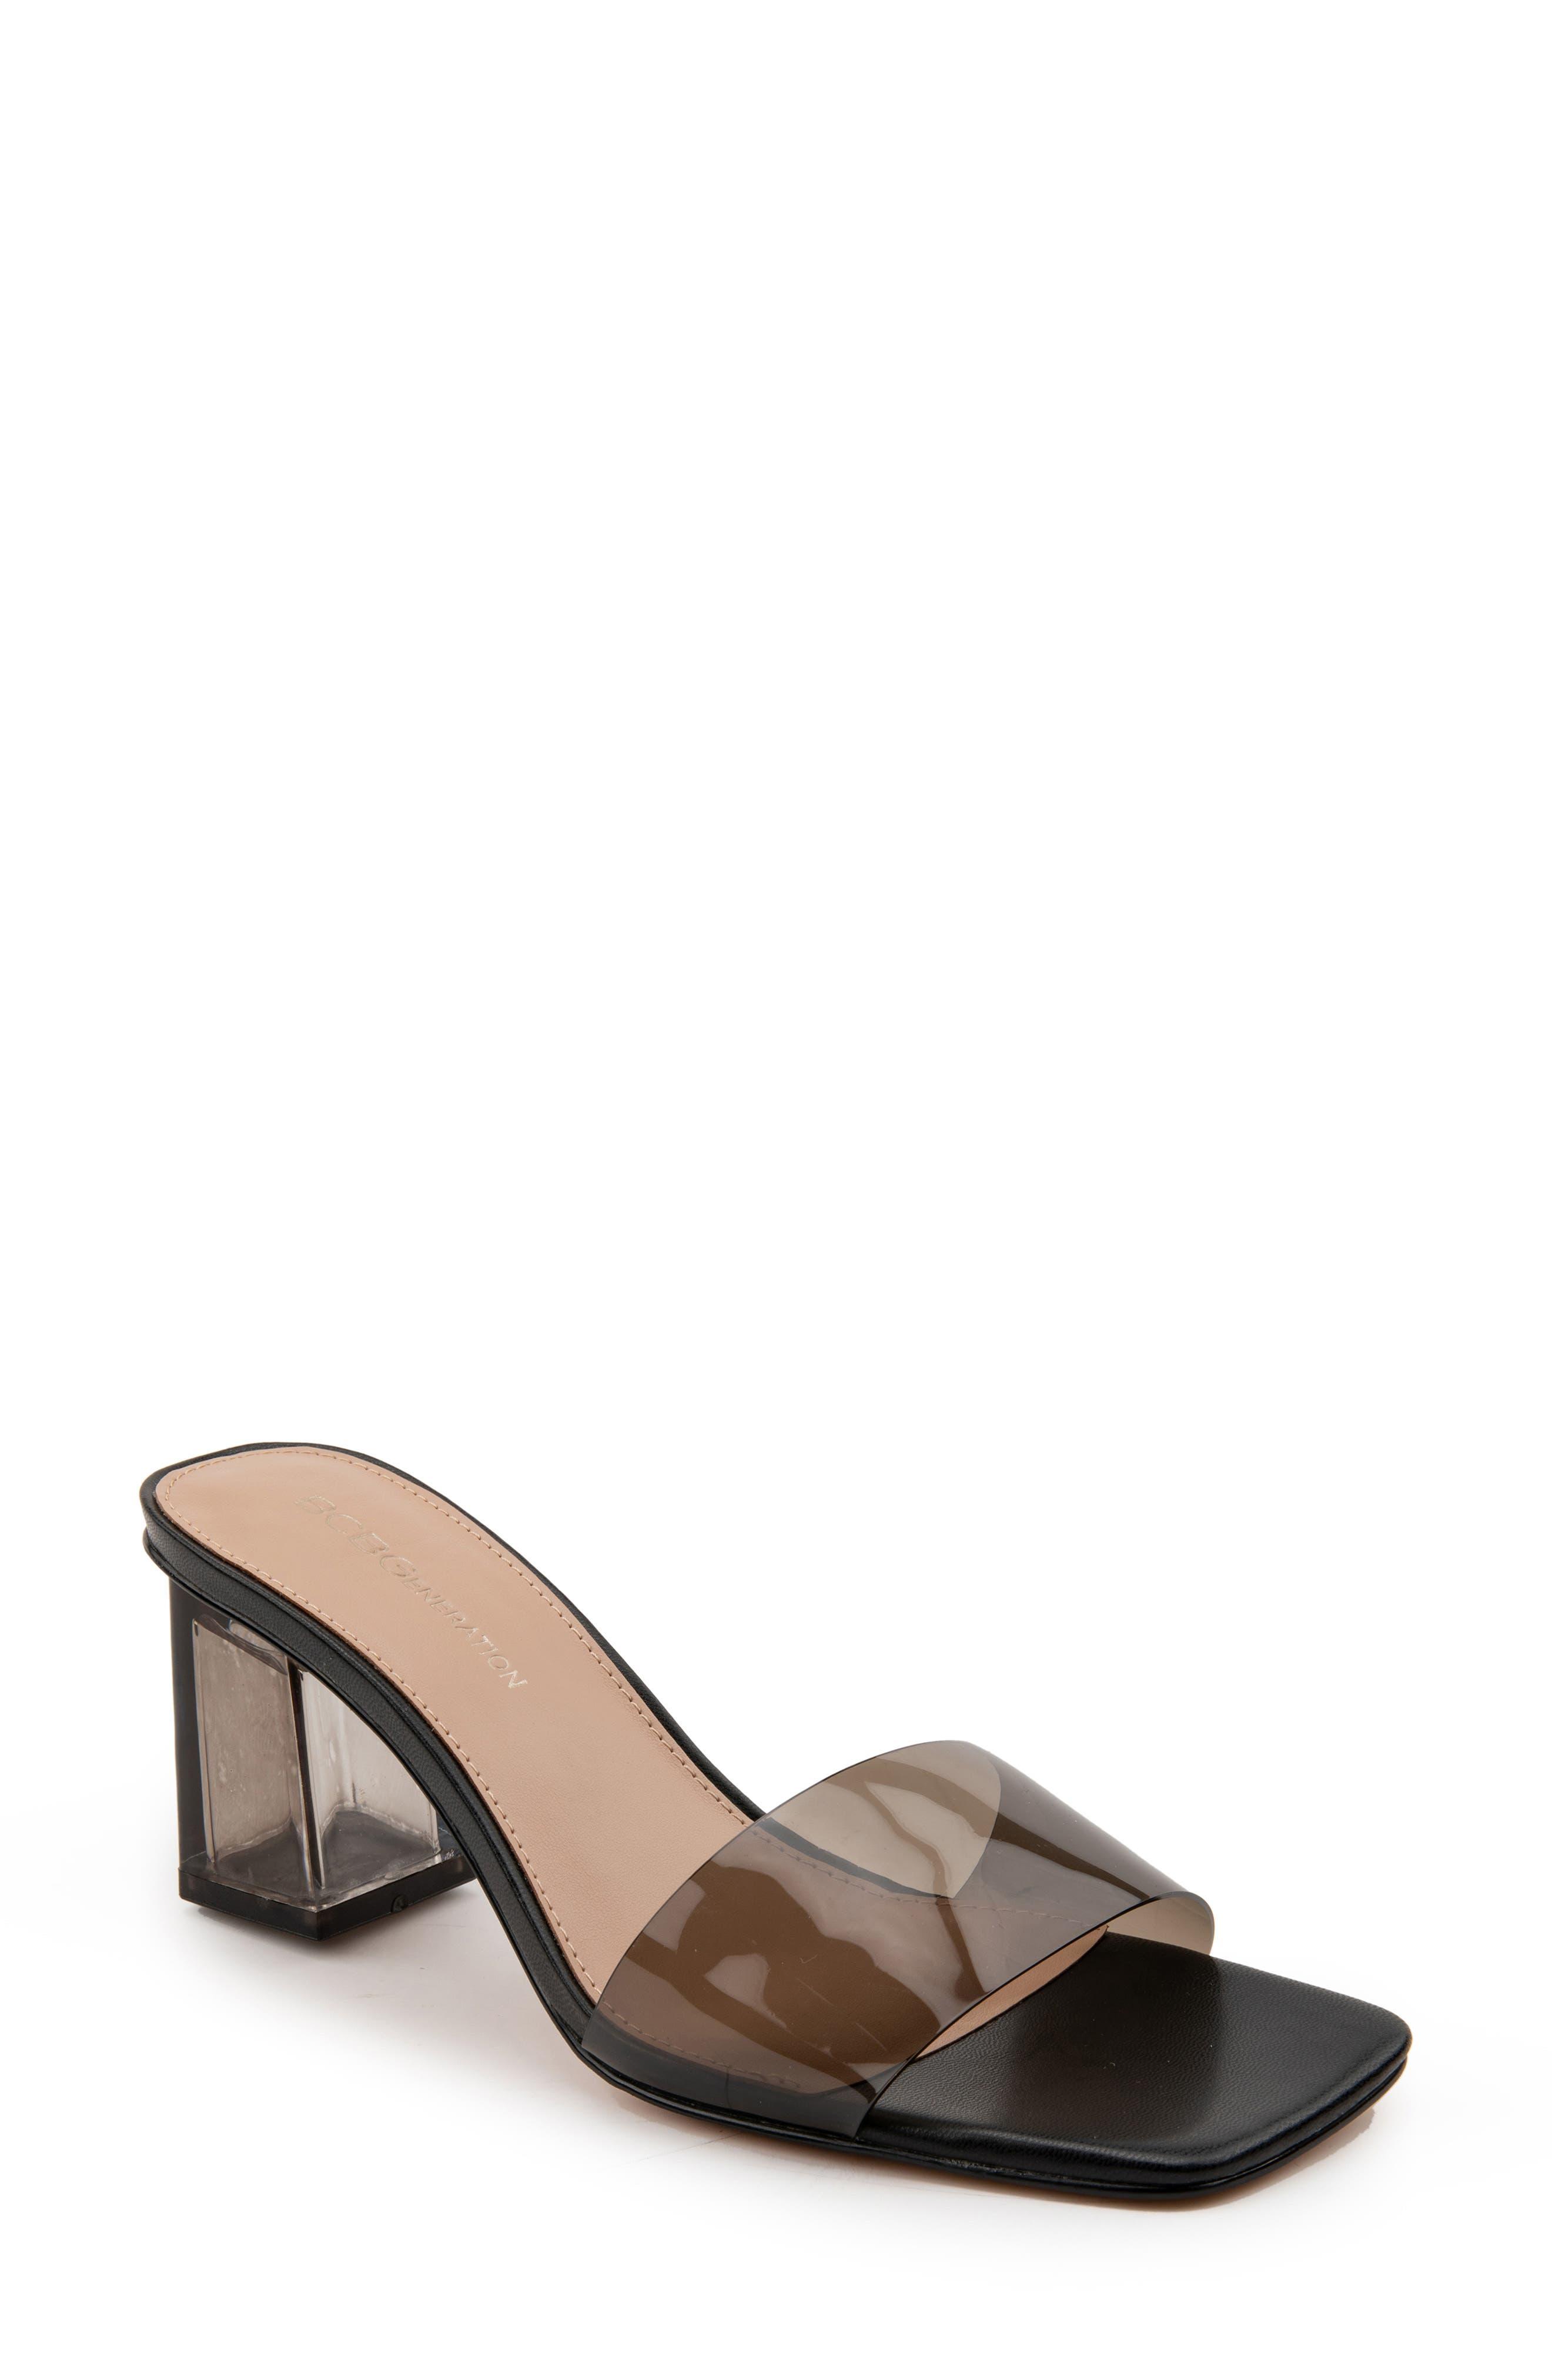 Luckee Block Heel Slide Sandal